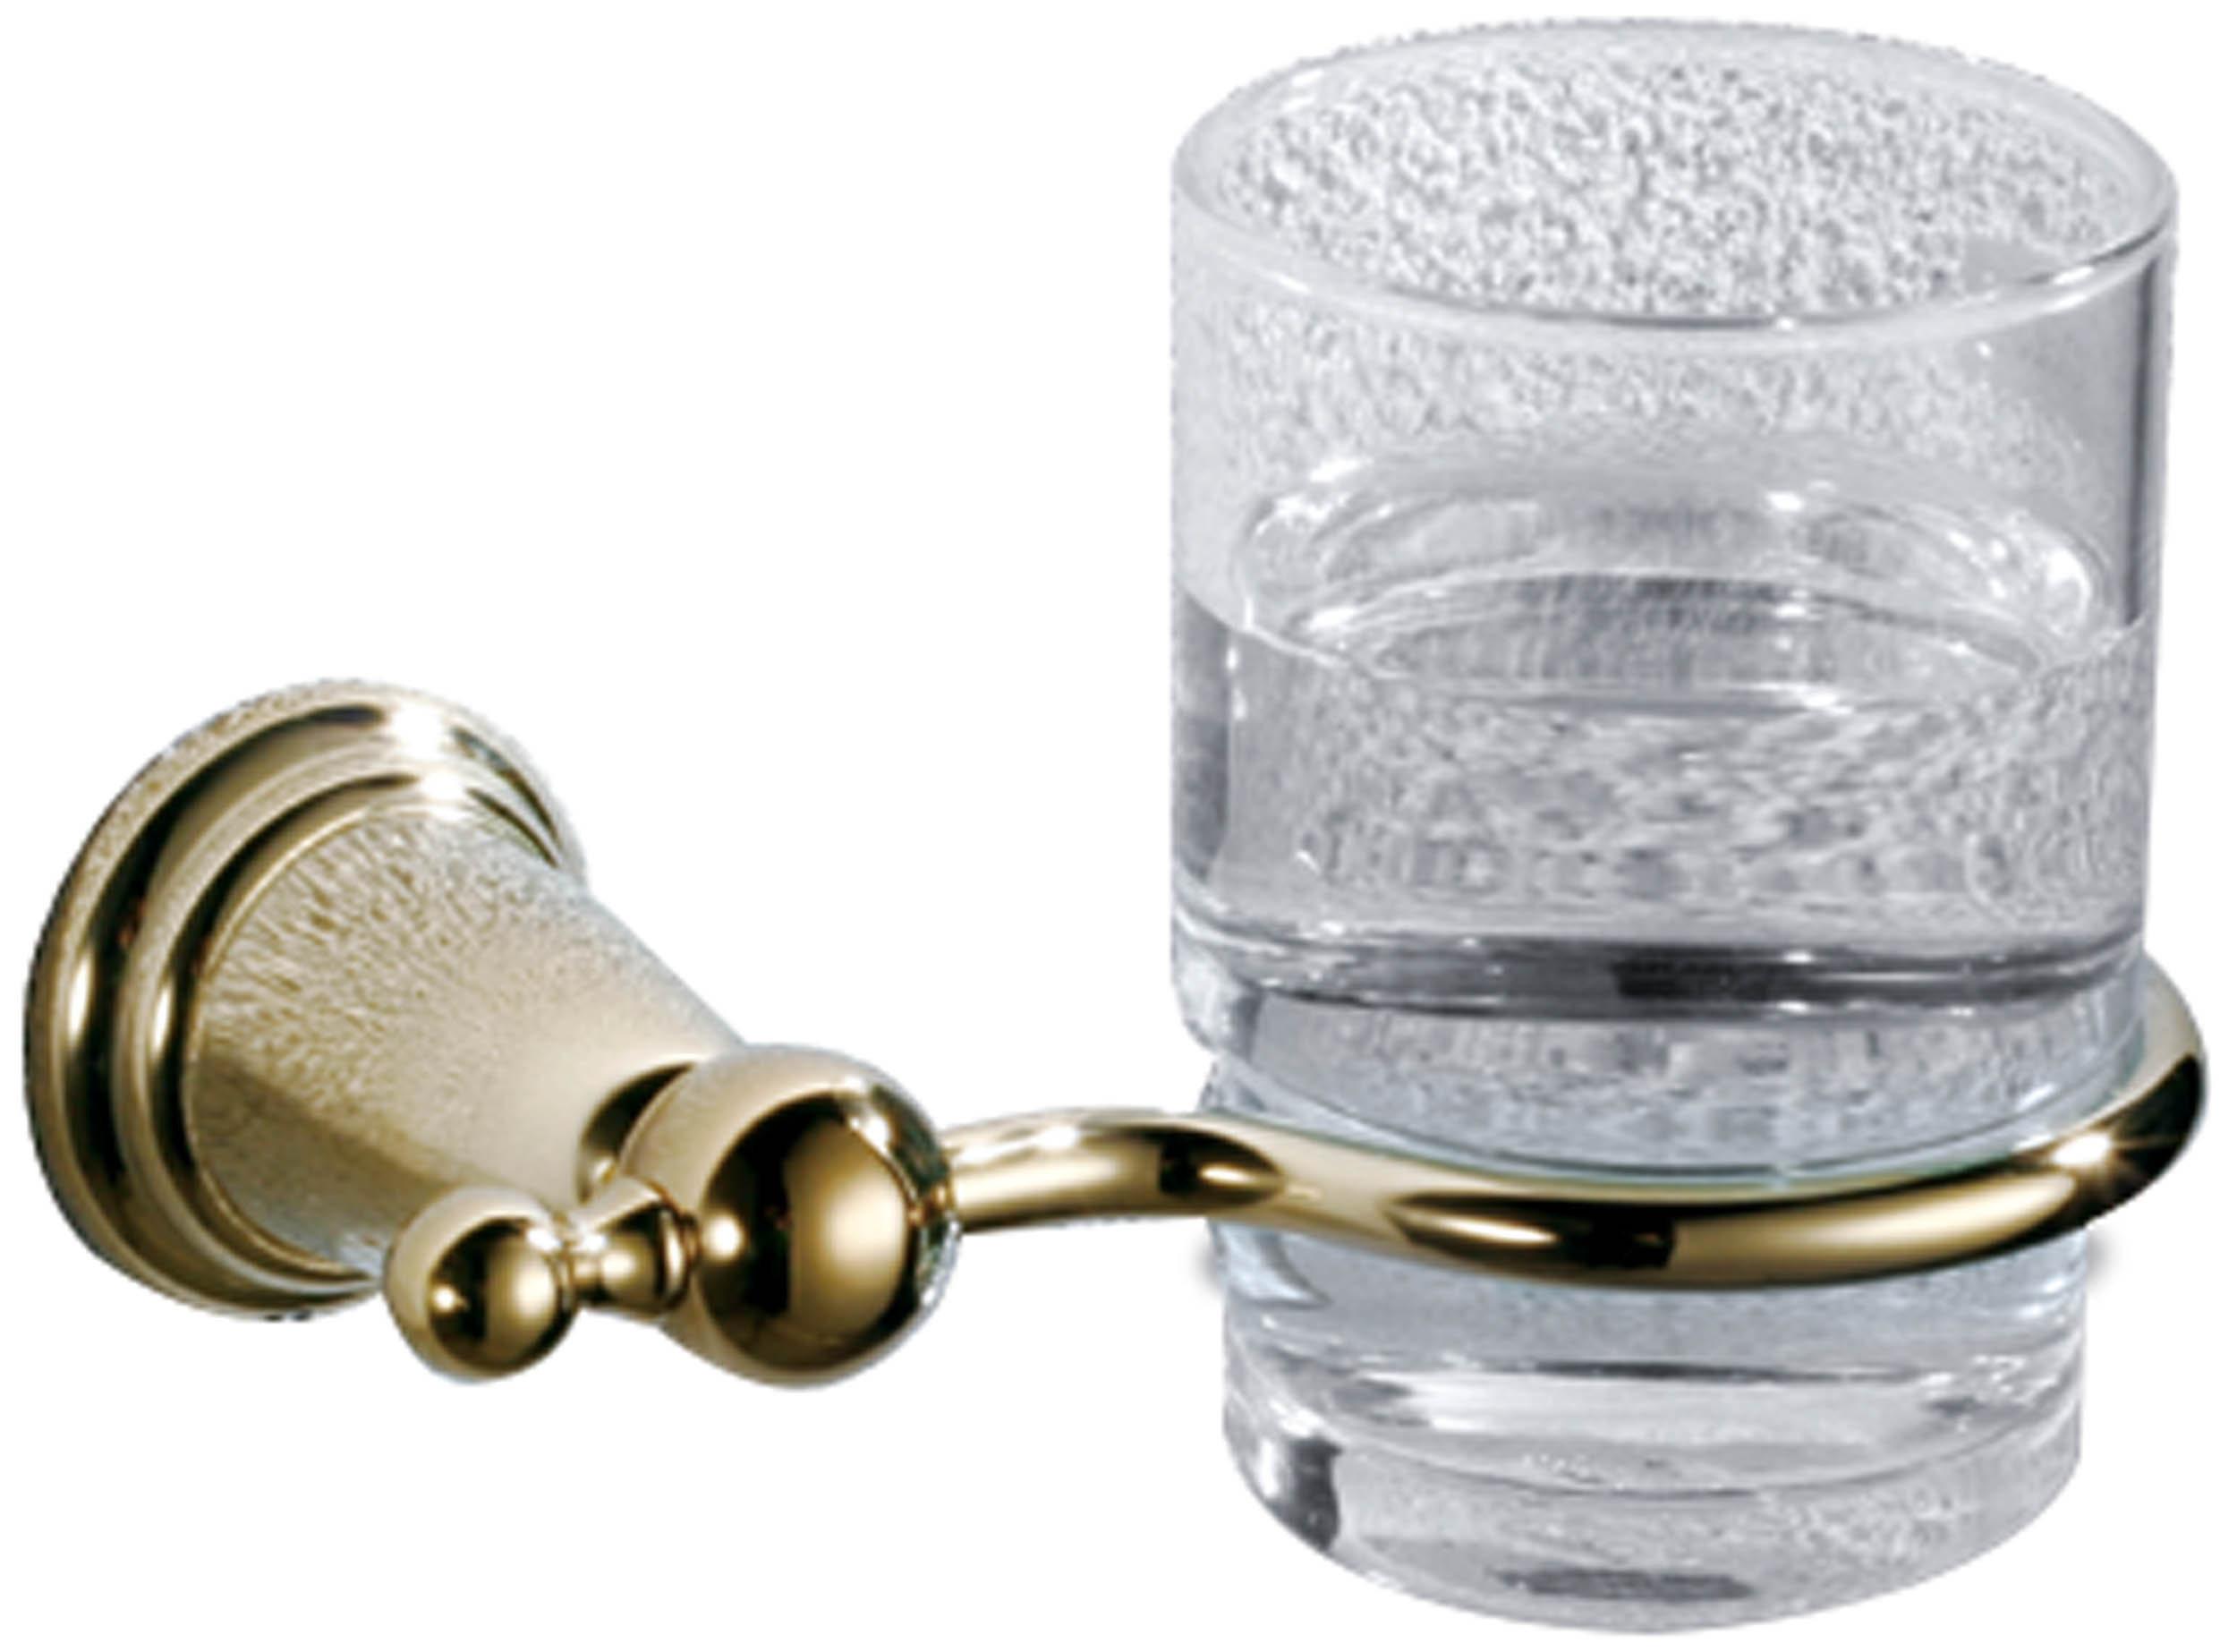 hardware bar compliant armand solid brass chrome signature shop ada accessories grab lp bathroom